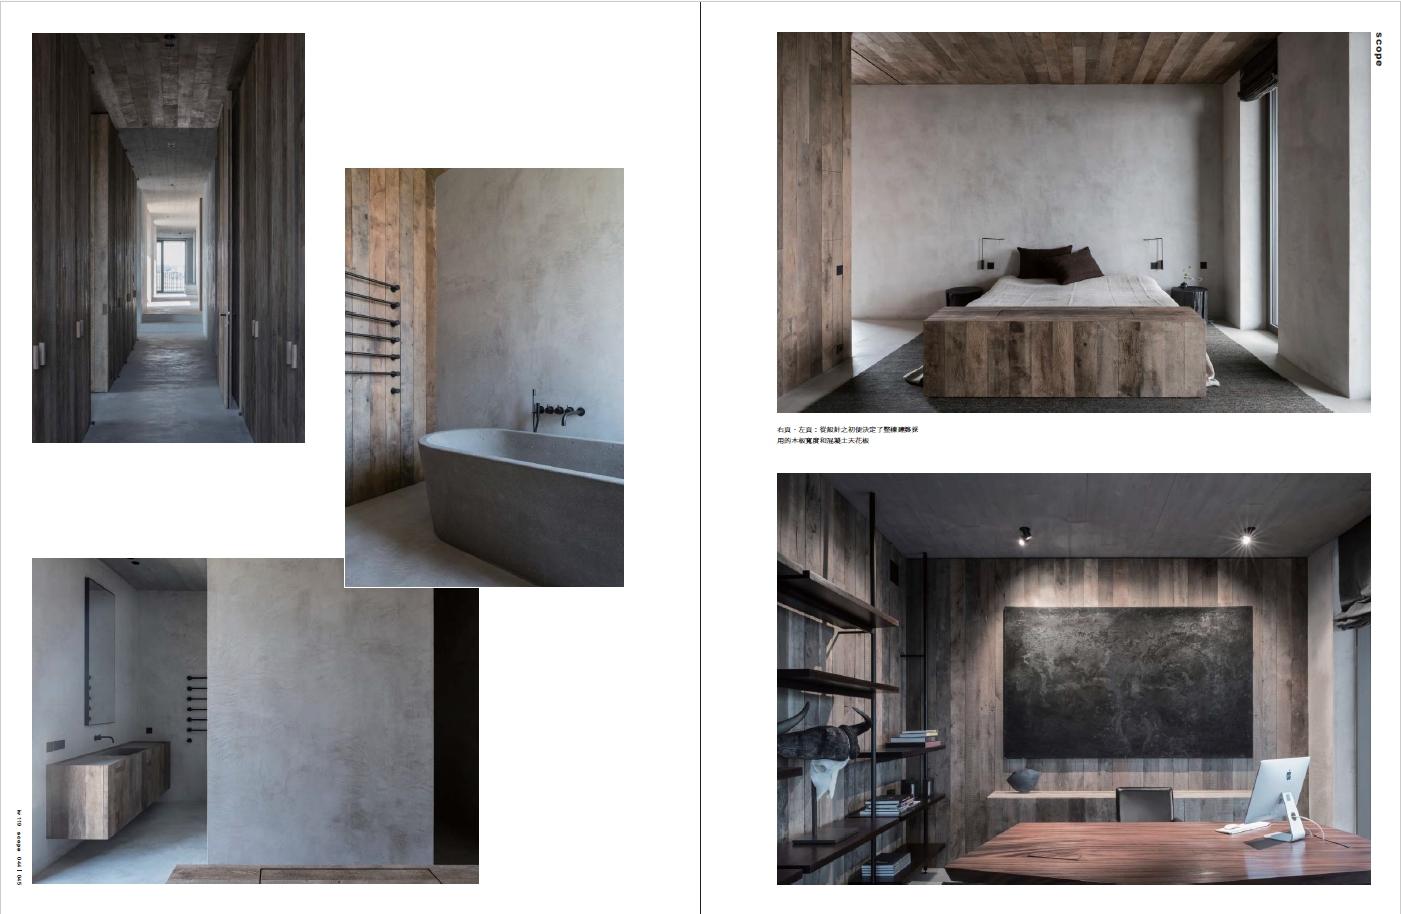 PUB_2018_IW Magazine_Vincent Van Duysen